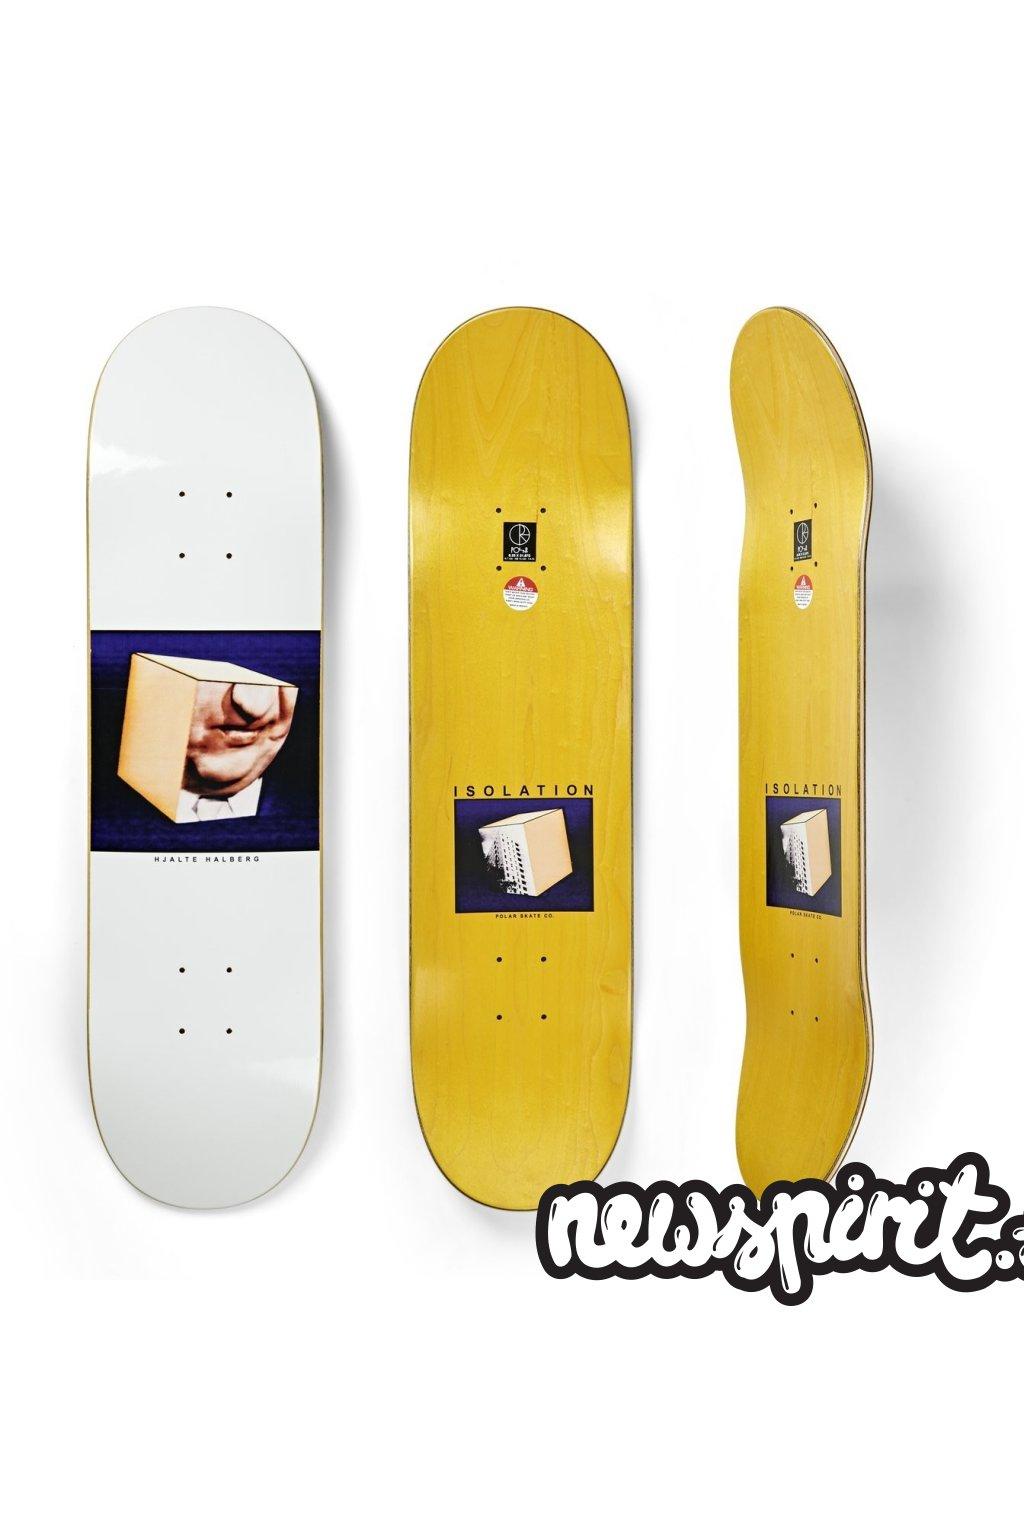 polar skateboard ISOLATION 8.25 1344x1344